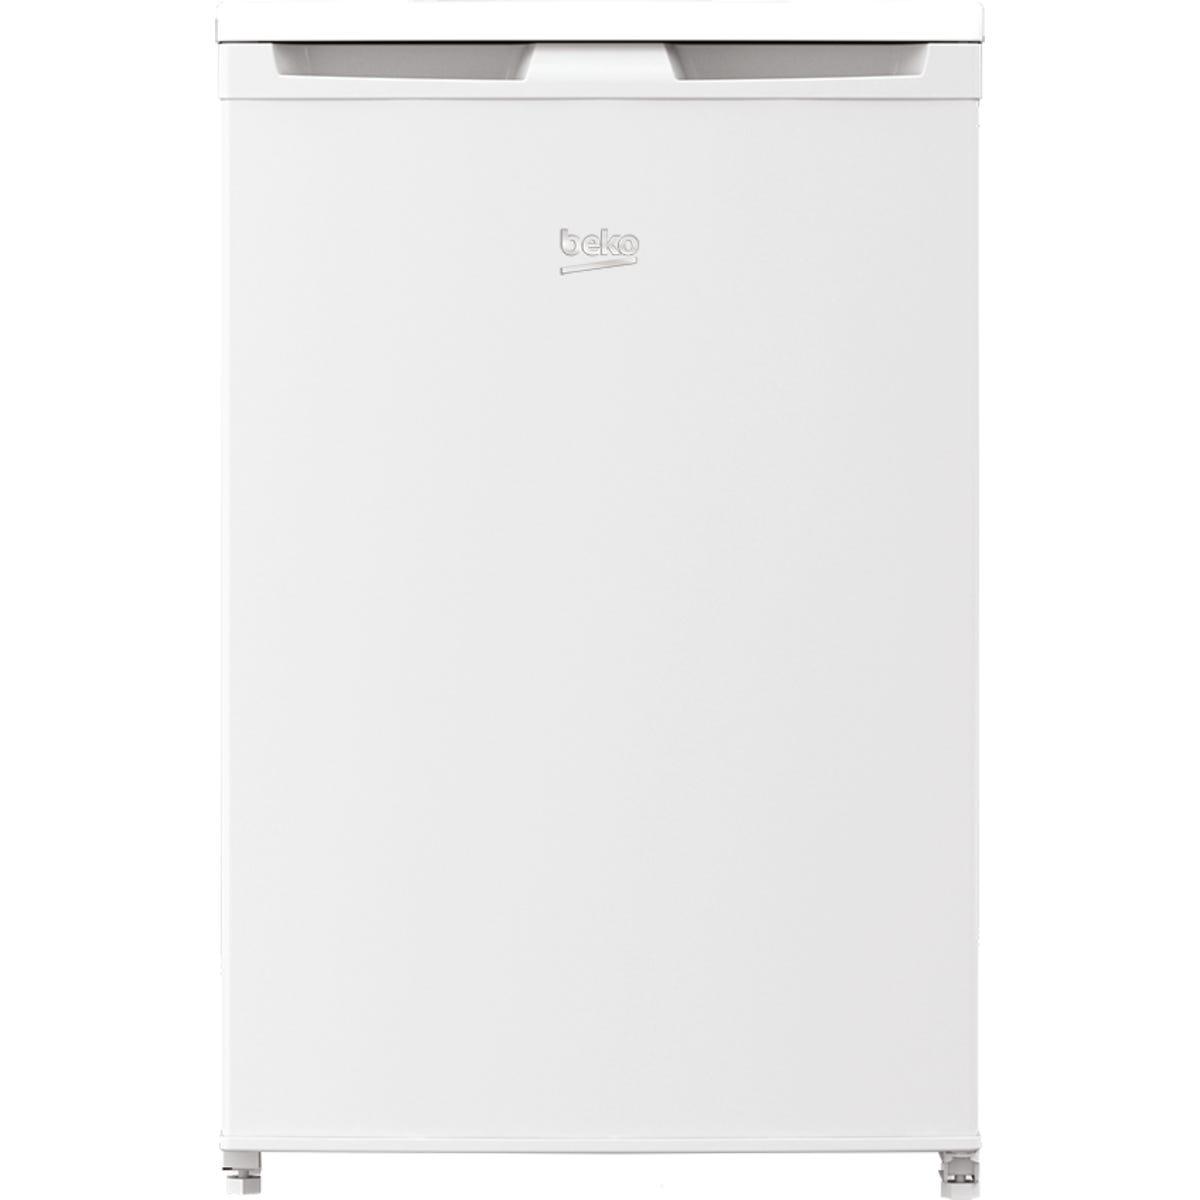 Beko UR4584W 101L Static Undercounter Fridge Freezer - White